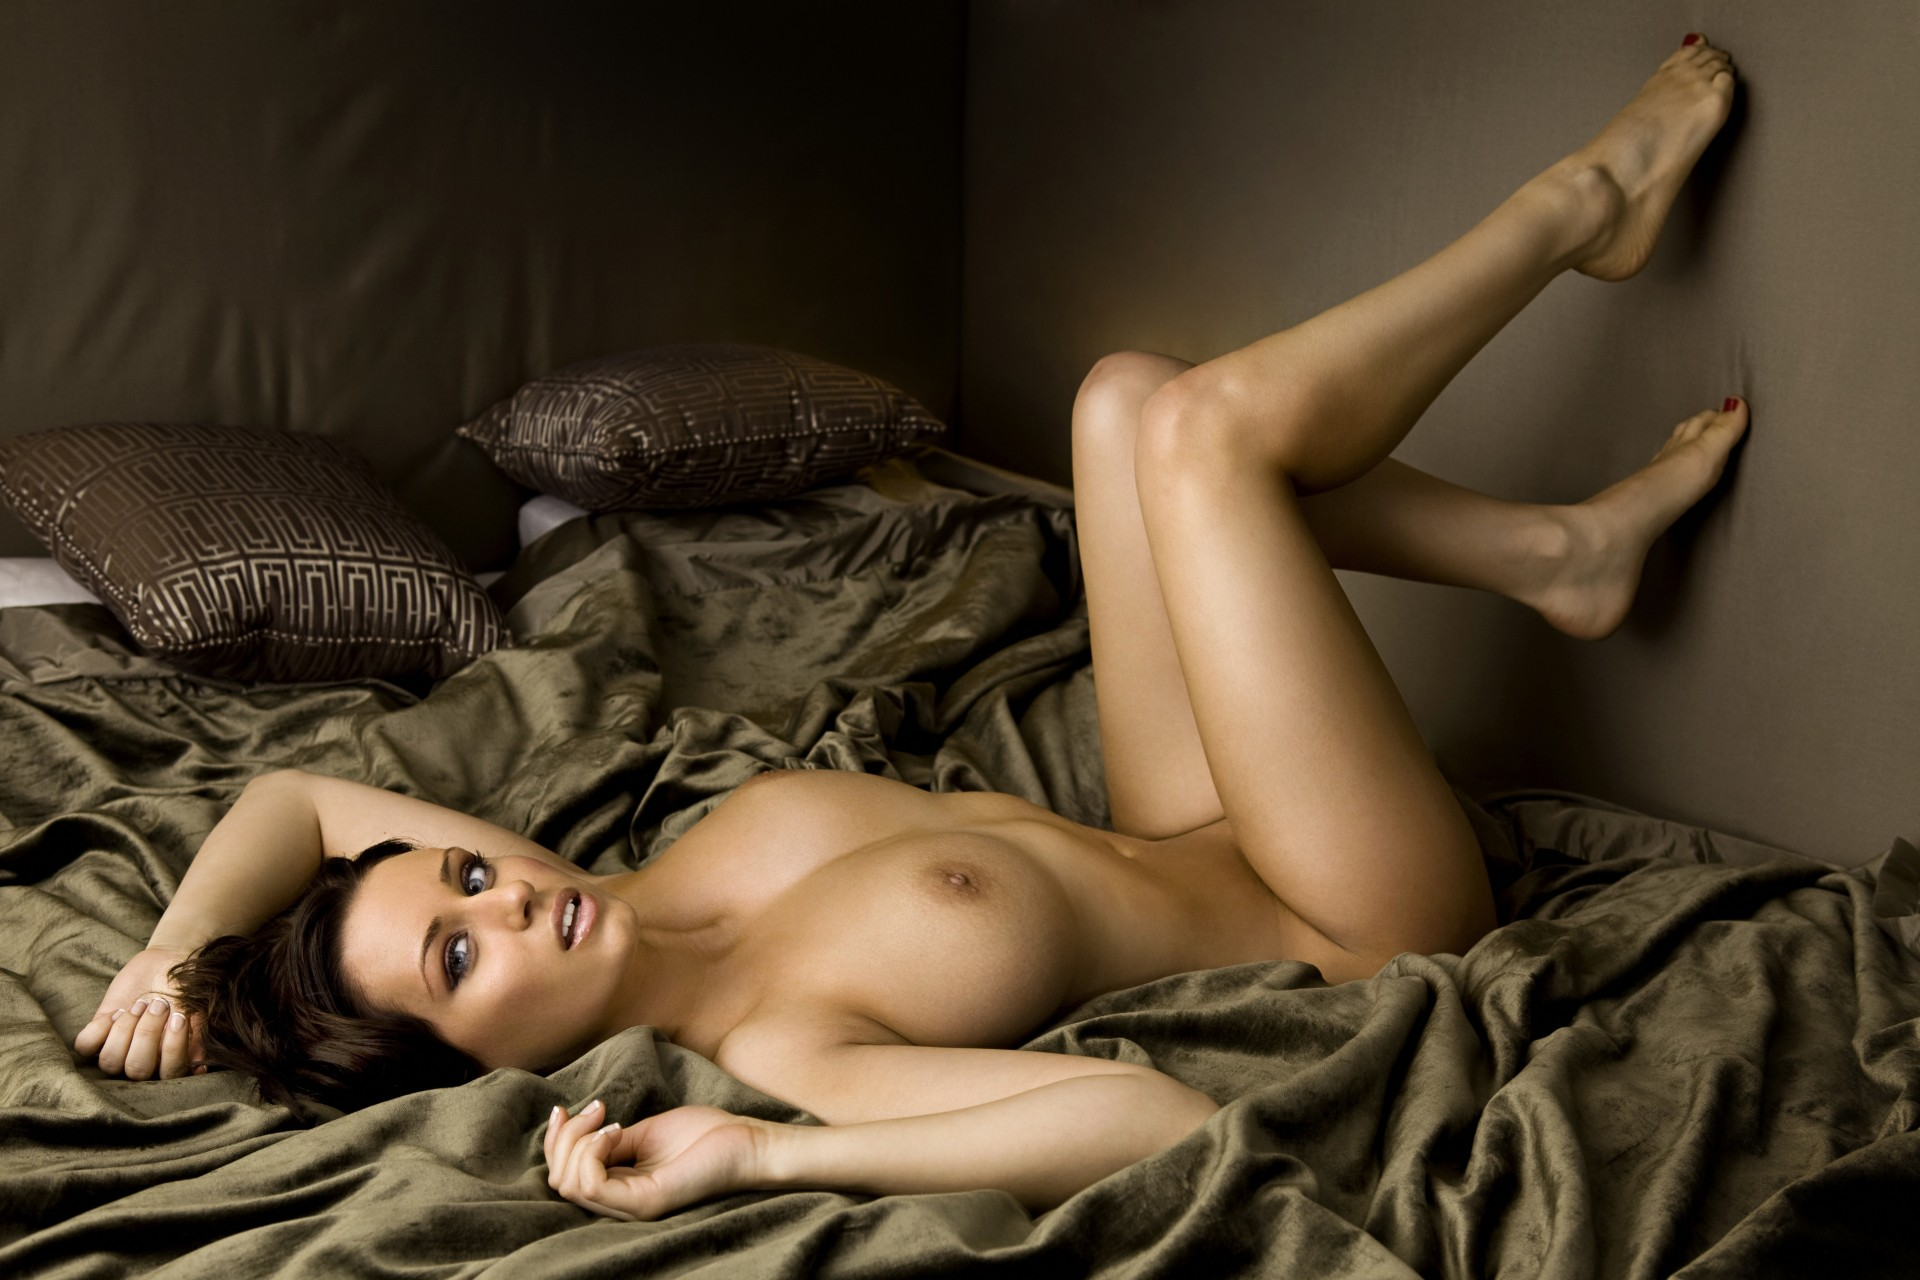 golie-siski-krasivih-devushek-foto-v-posteli